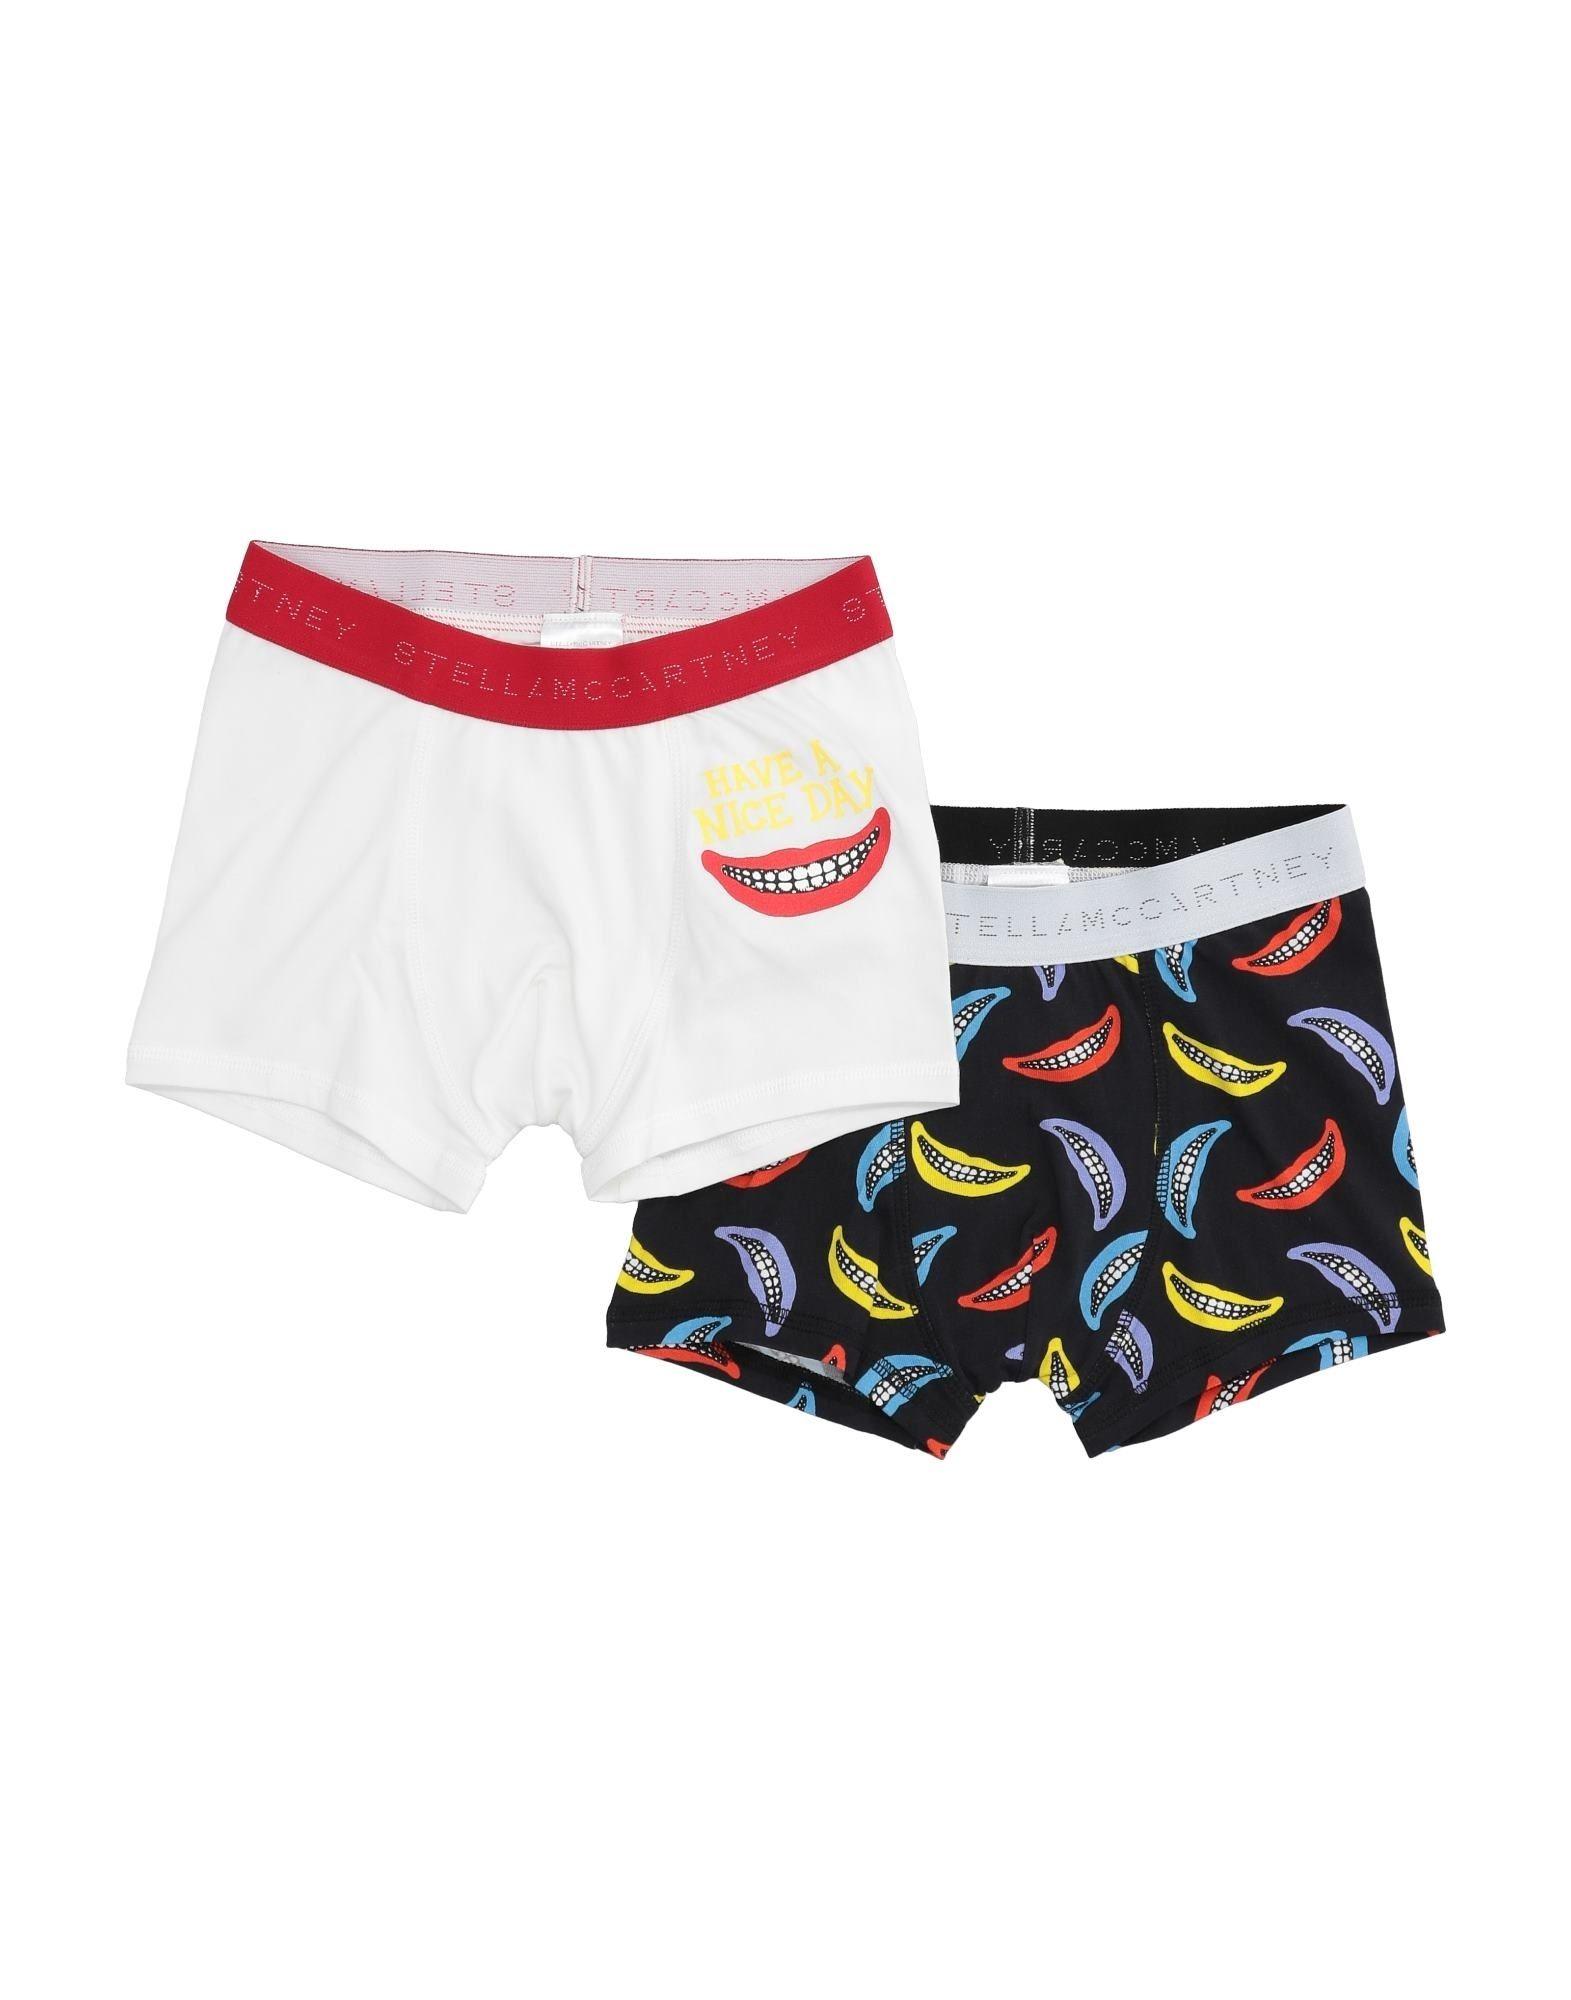 STELLA McCARTNEY KIDS Boxers. jersey, print, logo, two-tone, stretch, wash at 30degree c, do not dry clean, iron at 110degree c max, do not bleach, do not tumble dry, 2-piece set. 95% Cotton, 5% Elastane